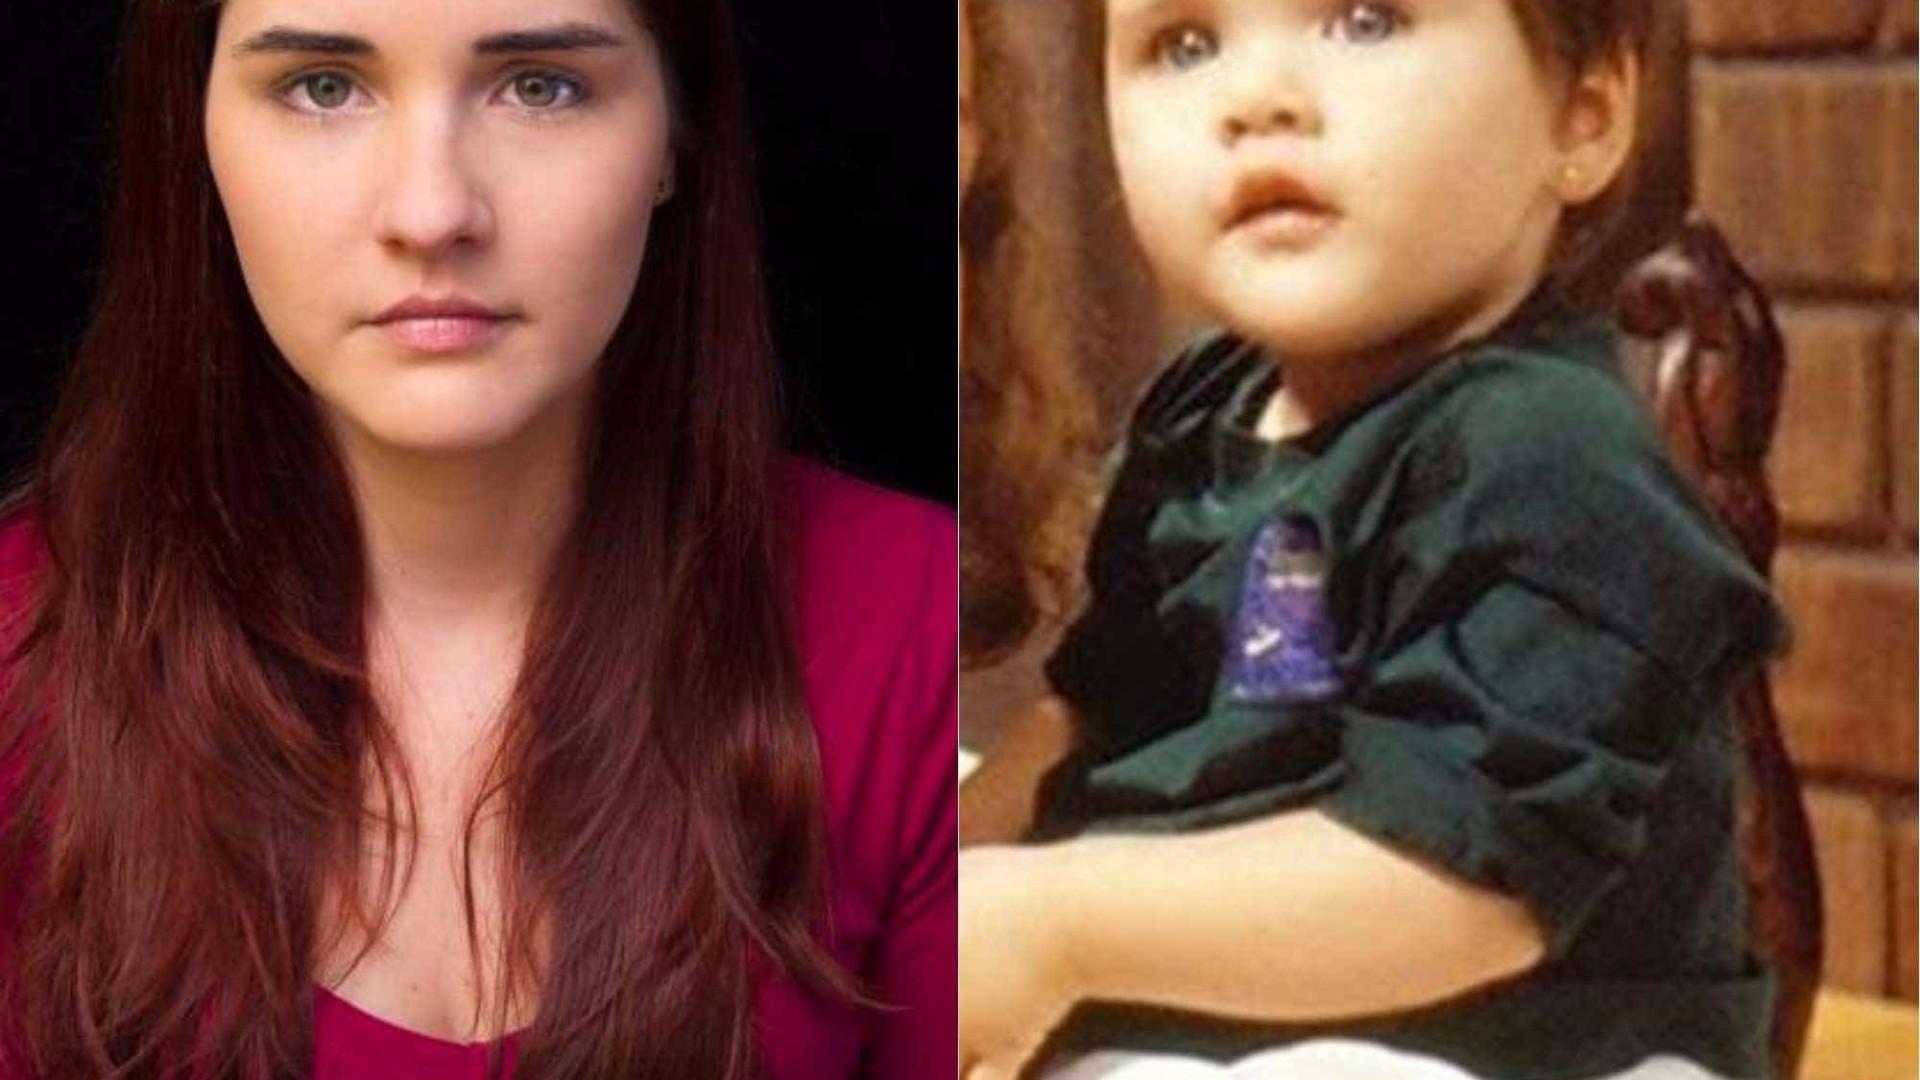 Por onde anda Beatriz Bertu, a garotinha da novela 'Bebê a Bordo'?